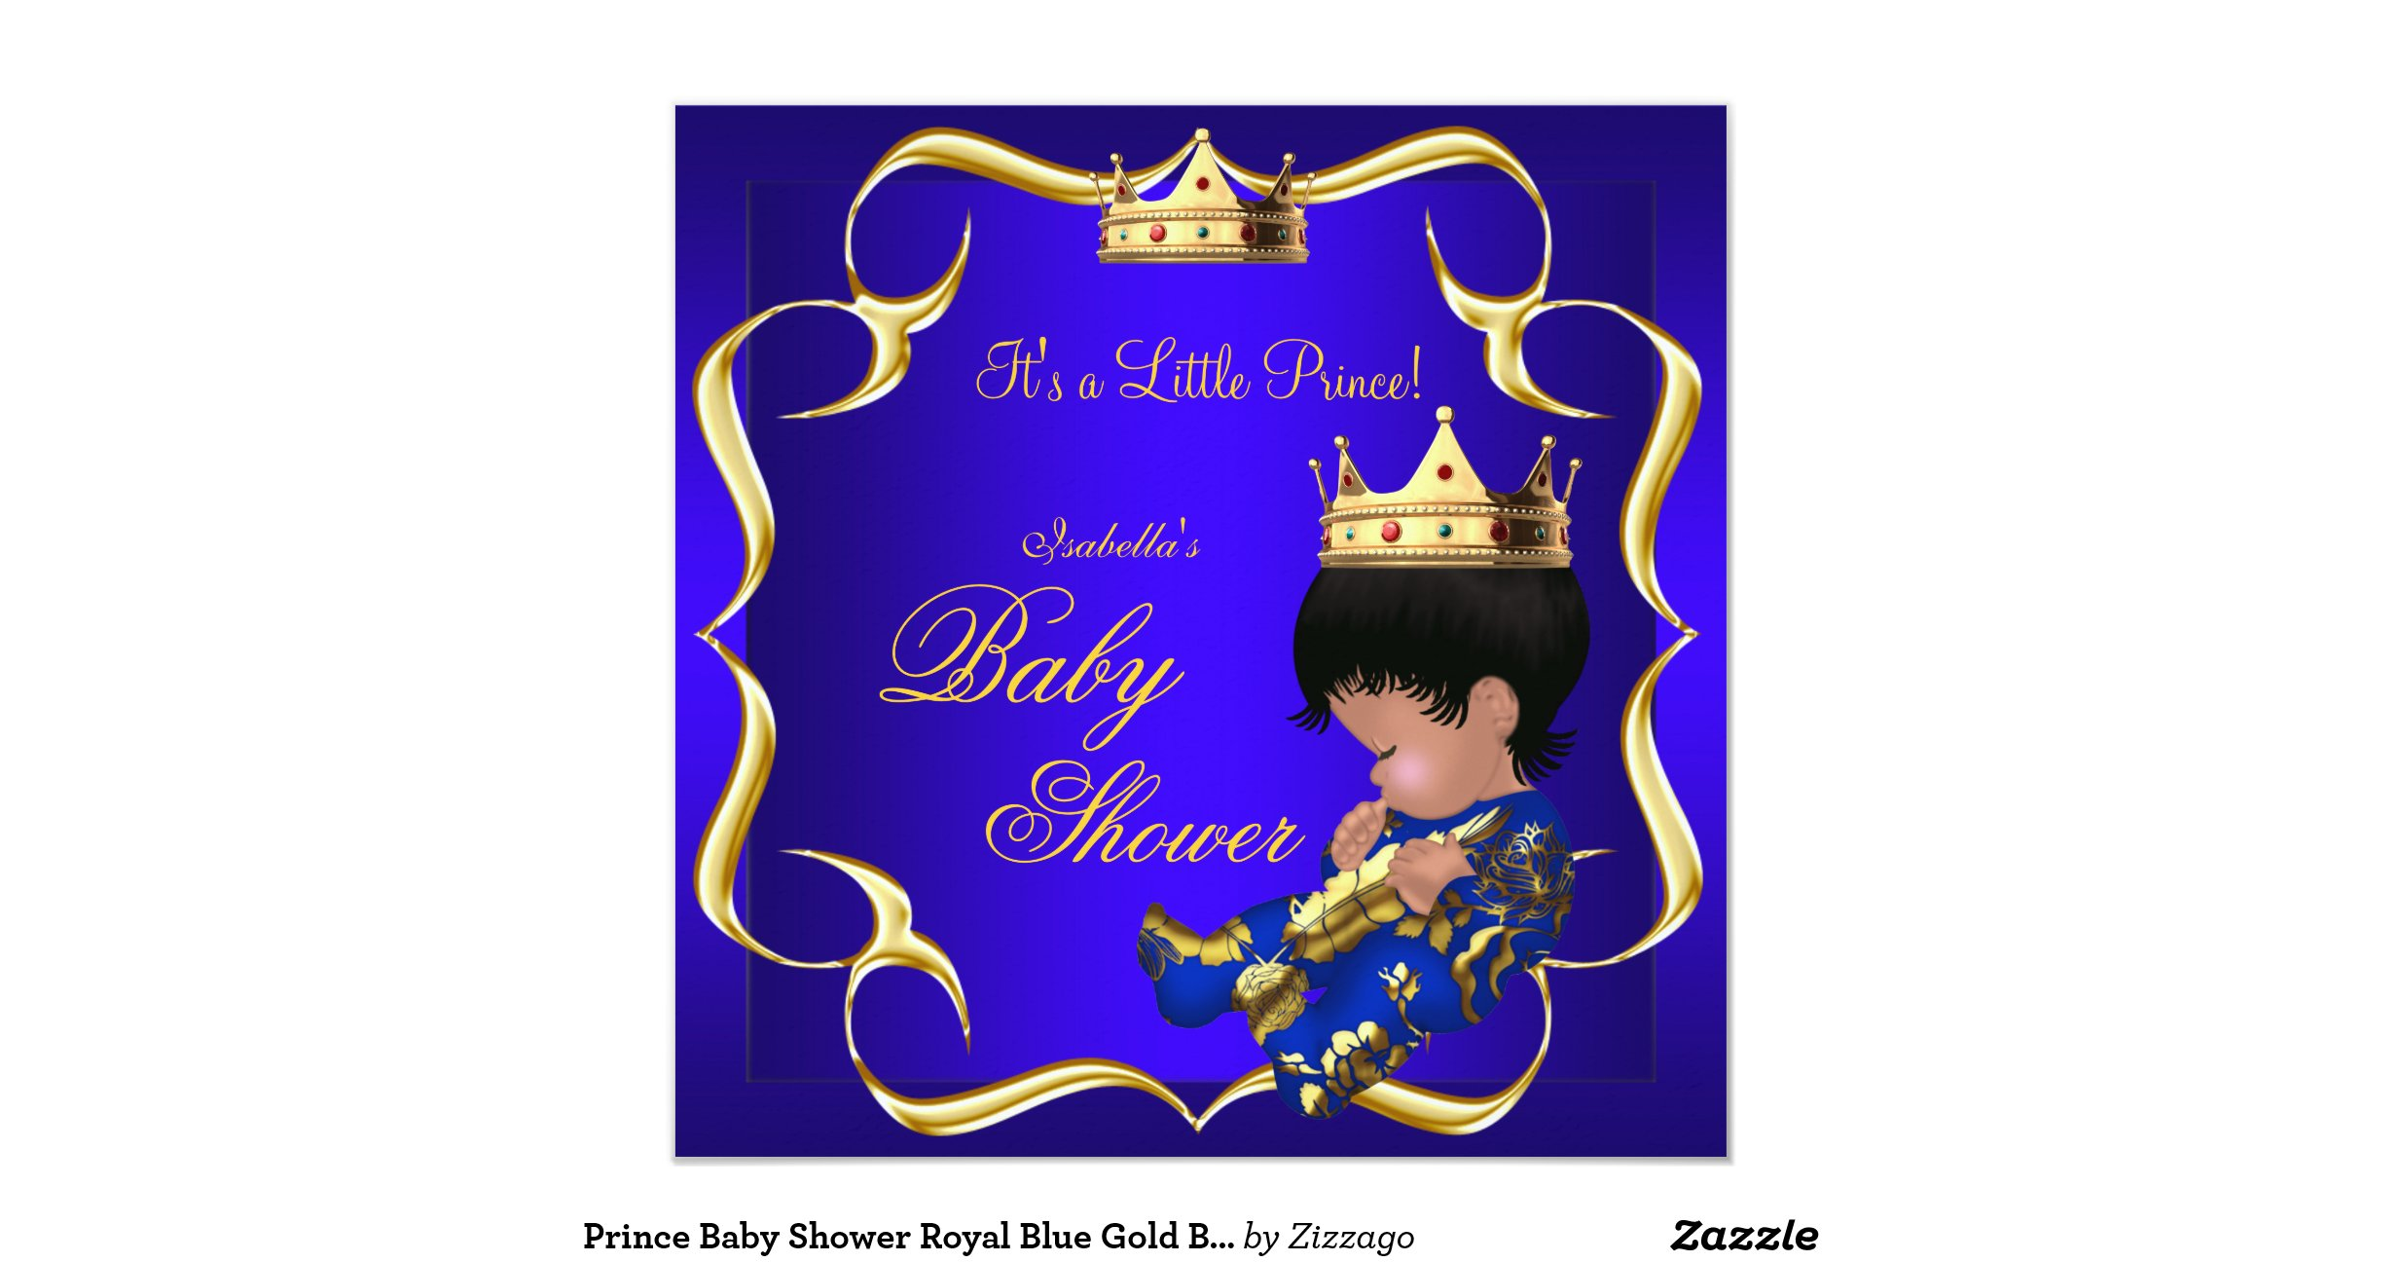 prince baby shower royal blue gold boy crown 3 invitation